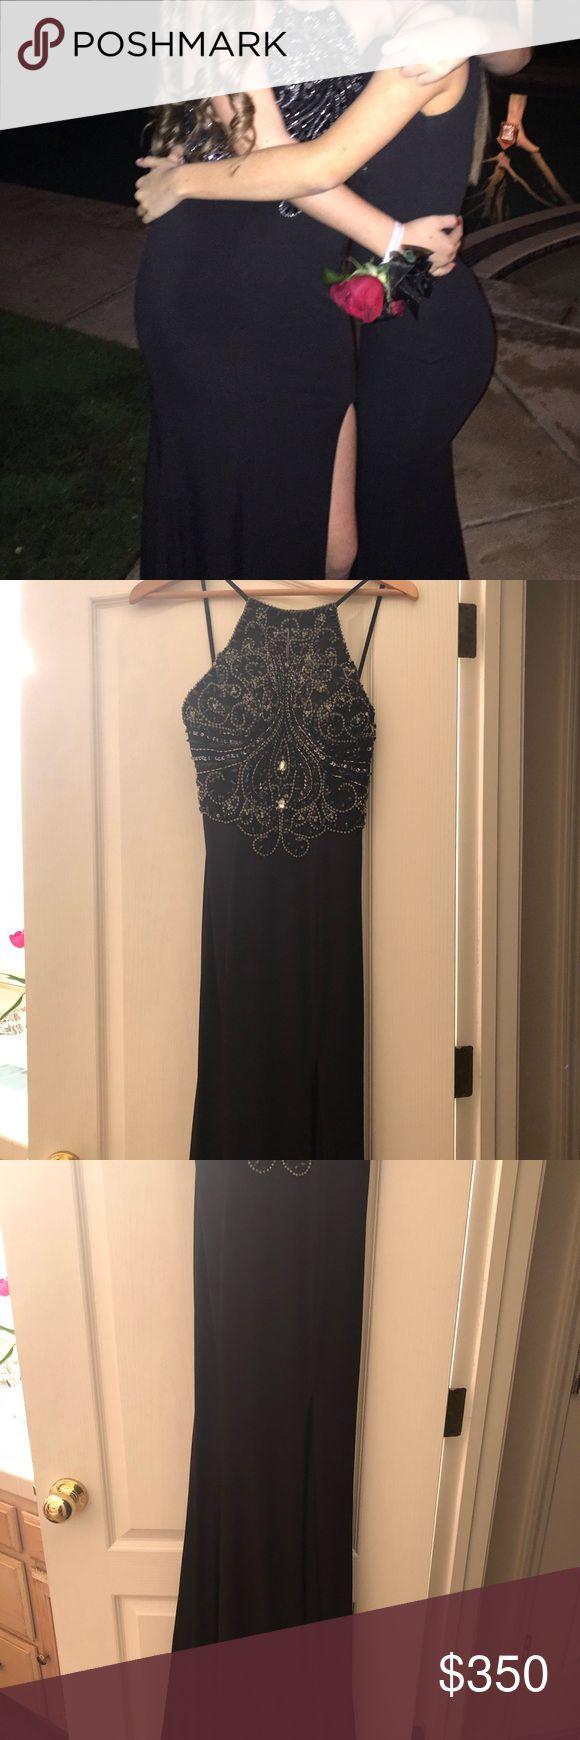 JOVANI Long Black sequin dress JOVANI Long Black sequin dress. Only worn one time. Low back and a slit detail. Flexible on price. Make me an offer! :) Jovani Dresses Prom